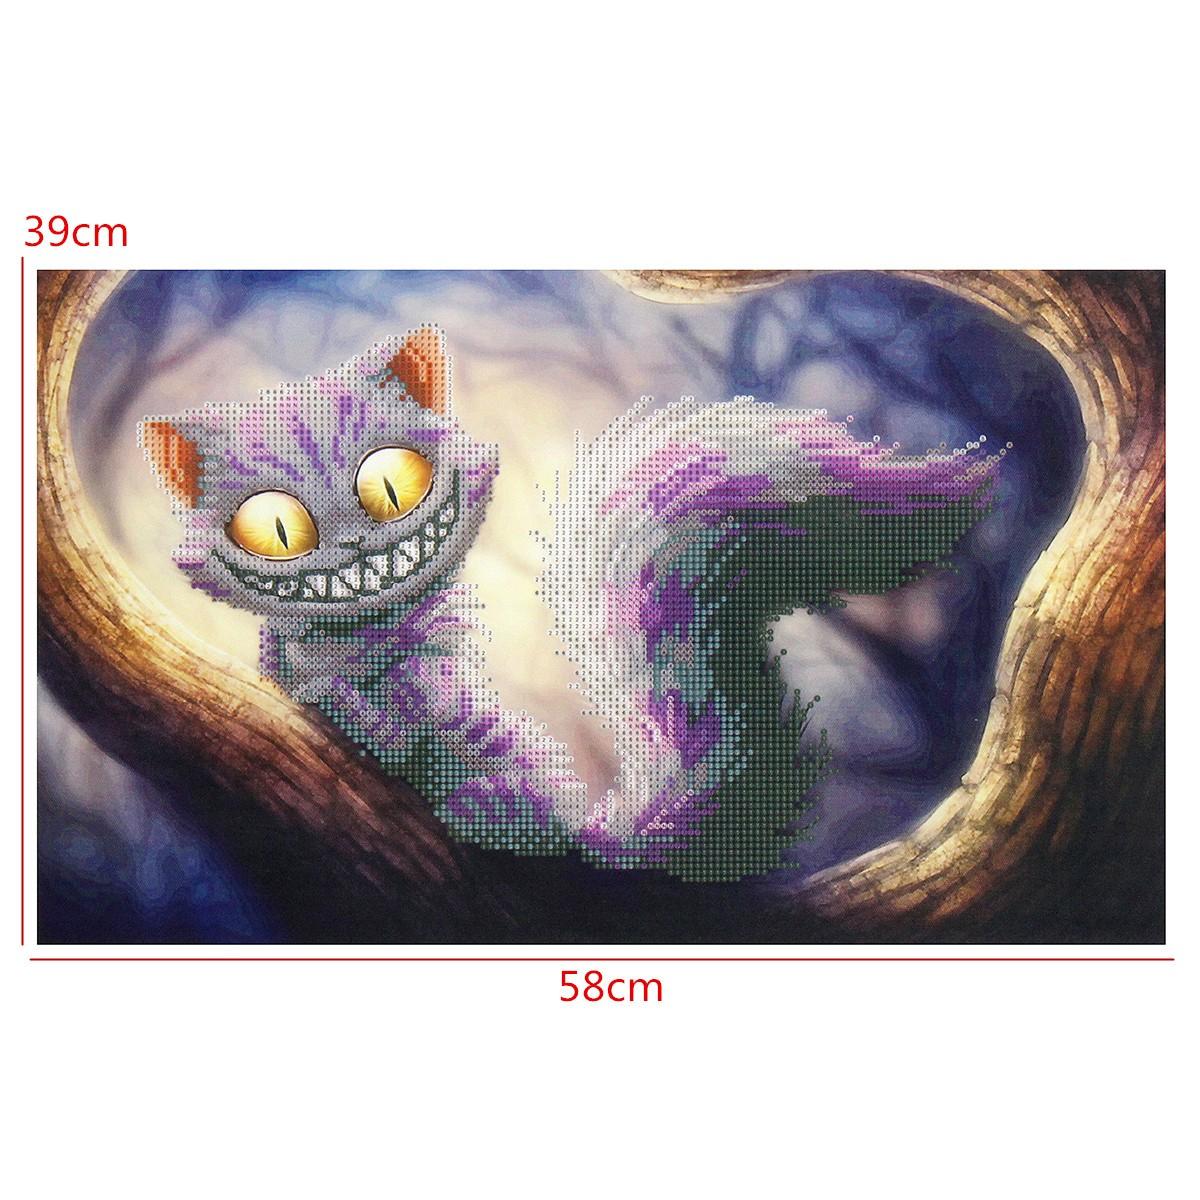 DIY 5D Diamond Embroidery Cat Diamond Painting Cross Stitch Kits Home Decor